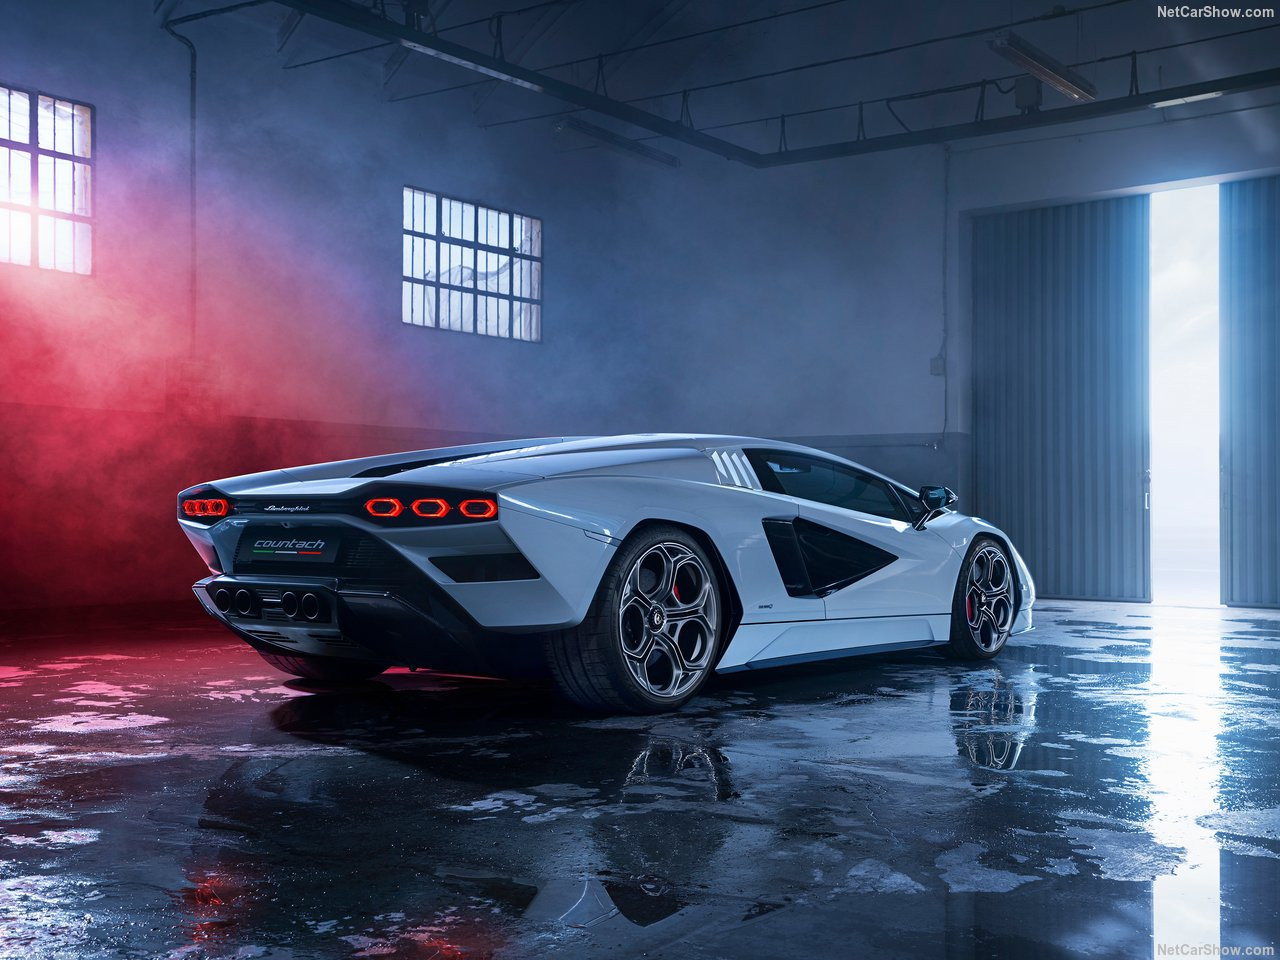 Lamborghini-Countach_LPI_800-4-2022-1280-10.jpg